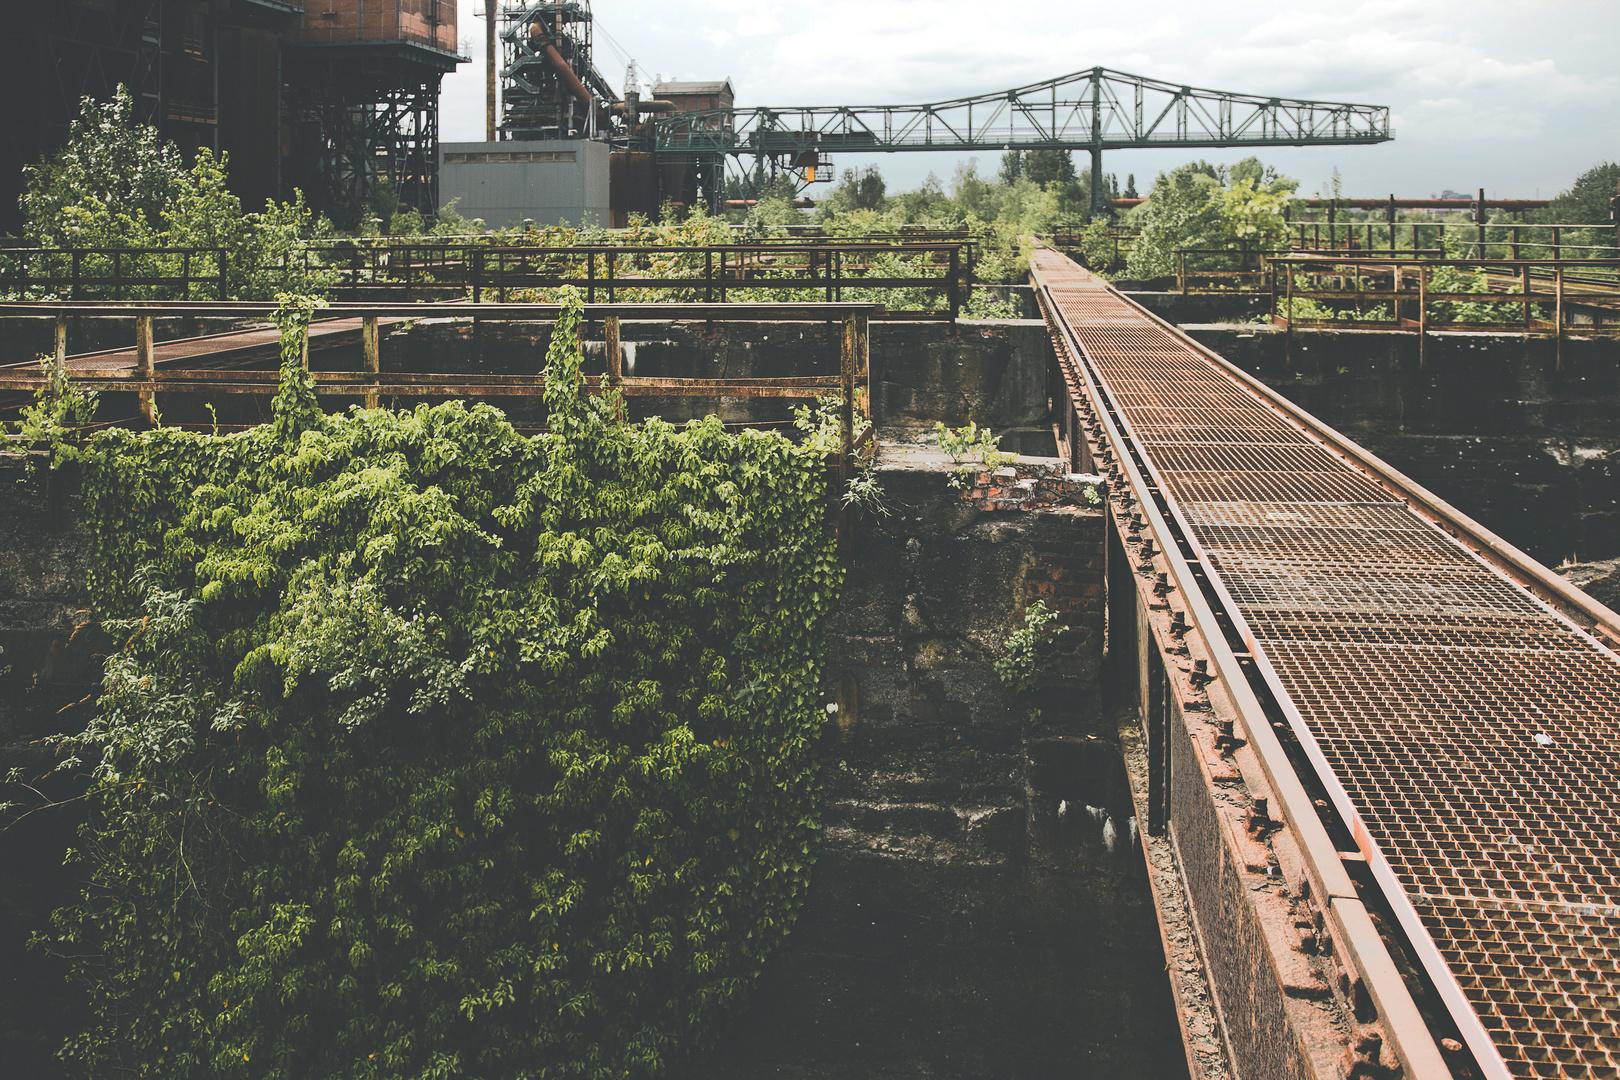 rusty way